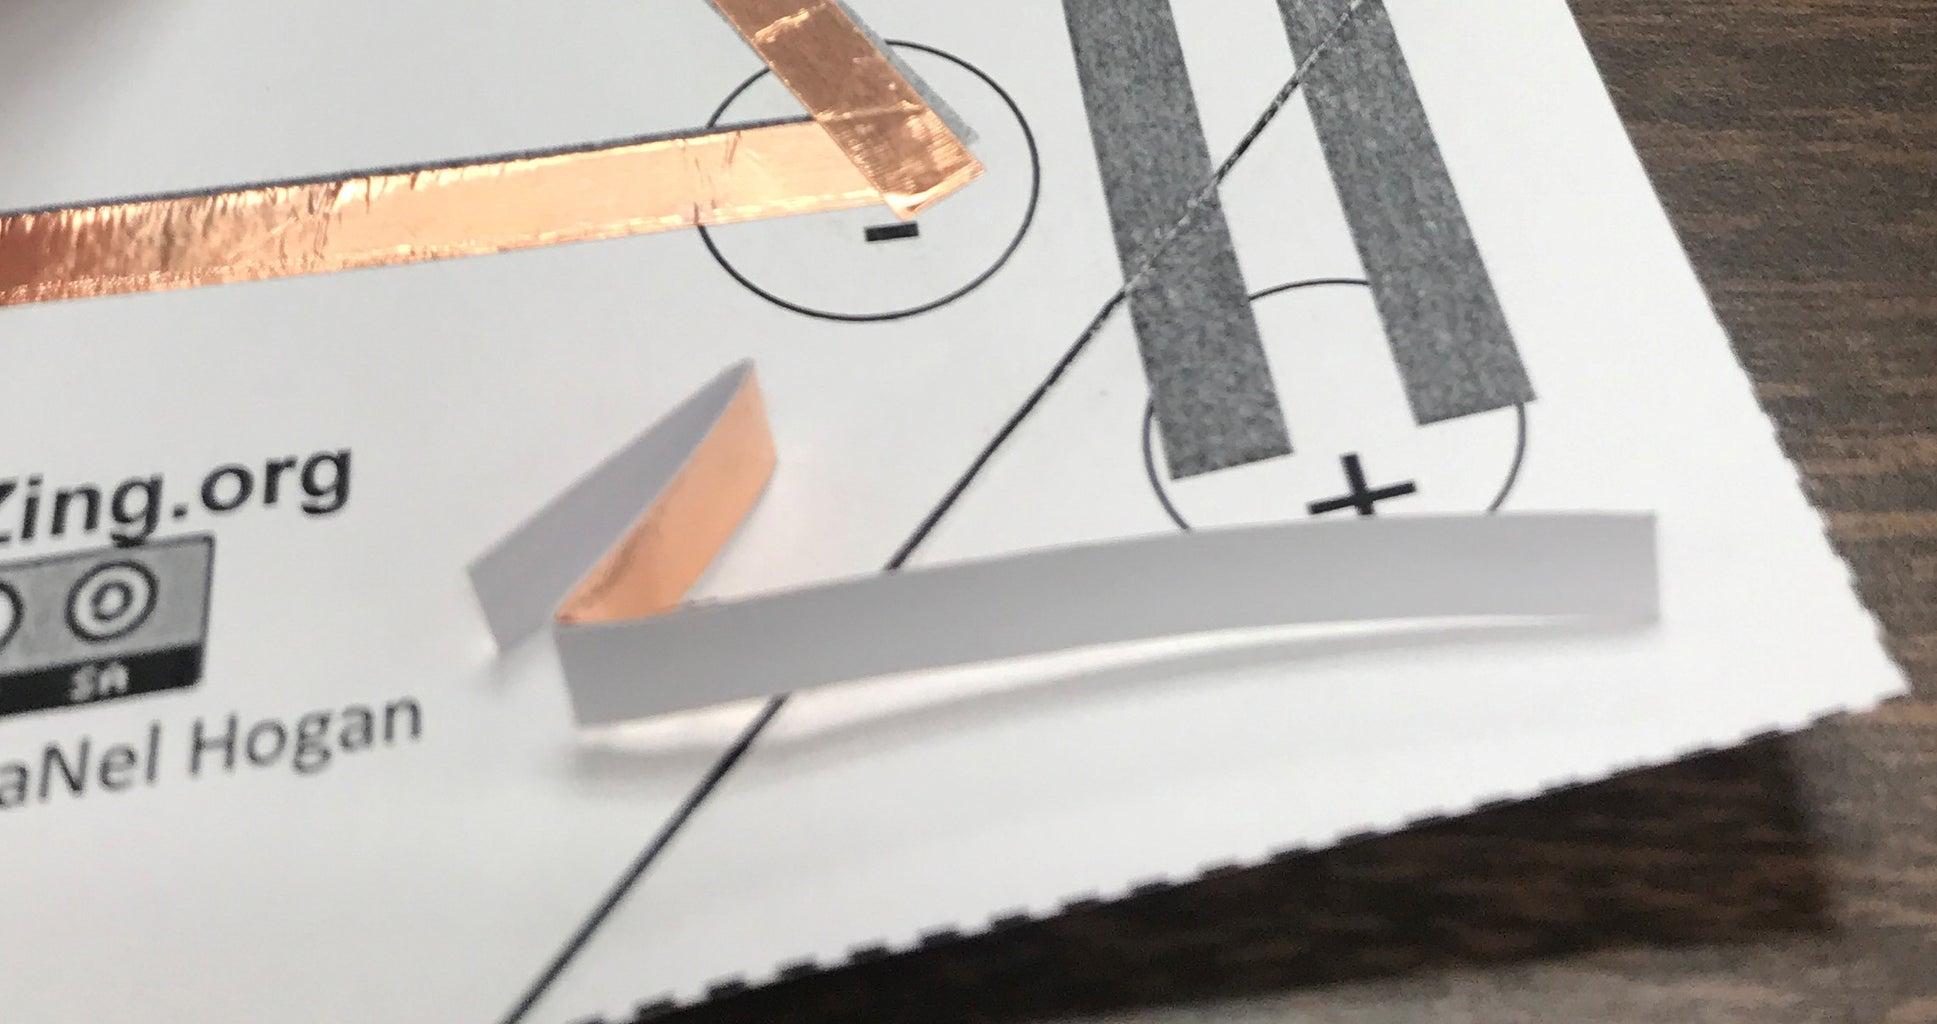 Making a Copper Foil Tape Switch.